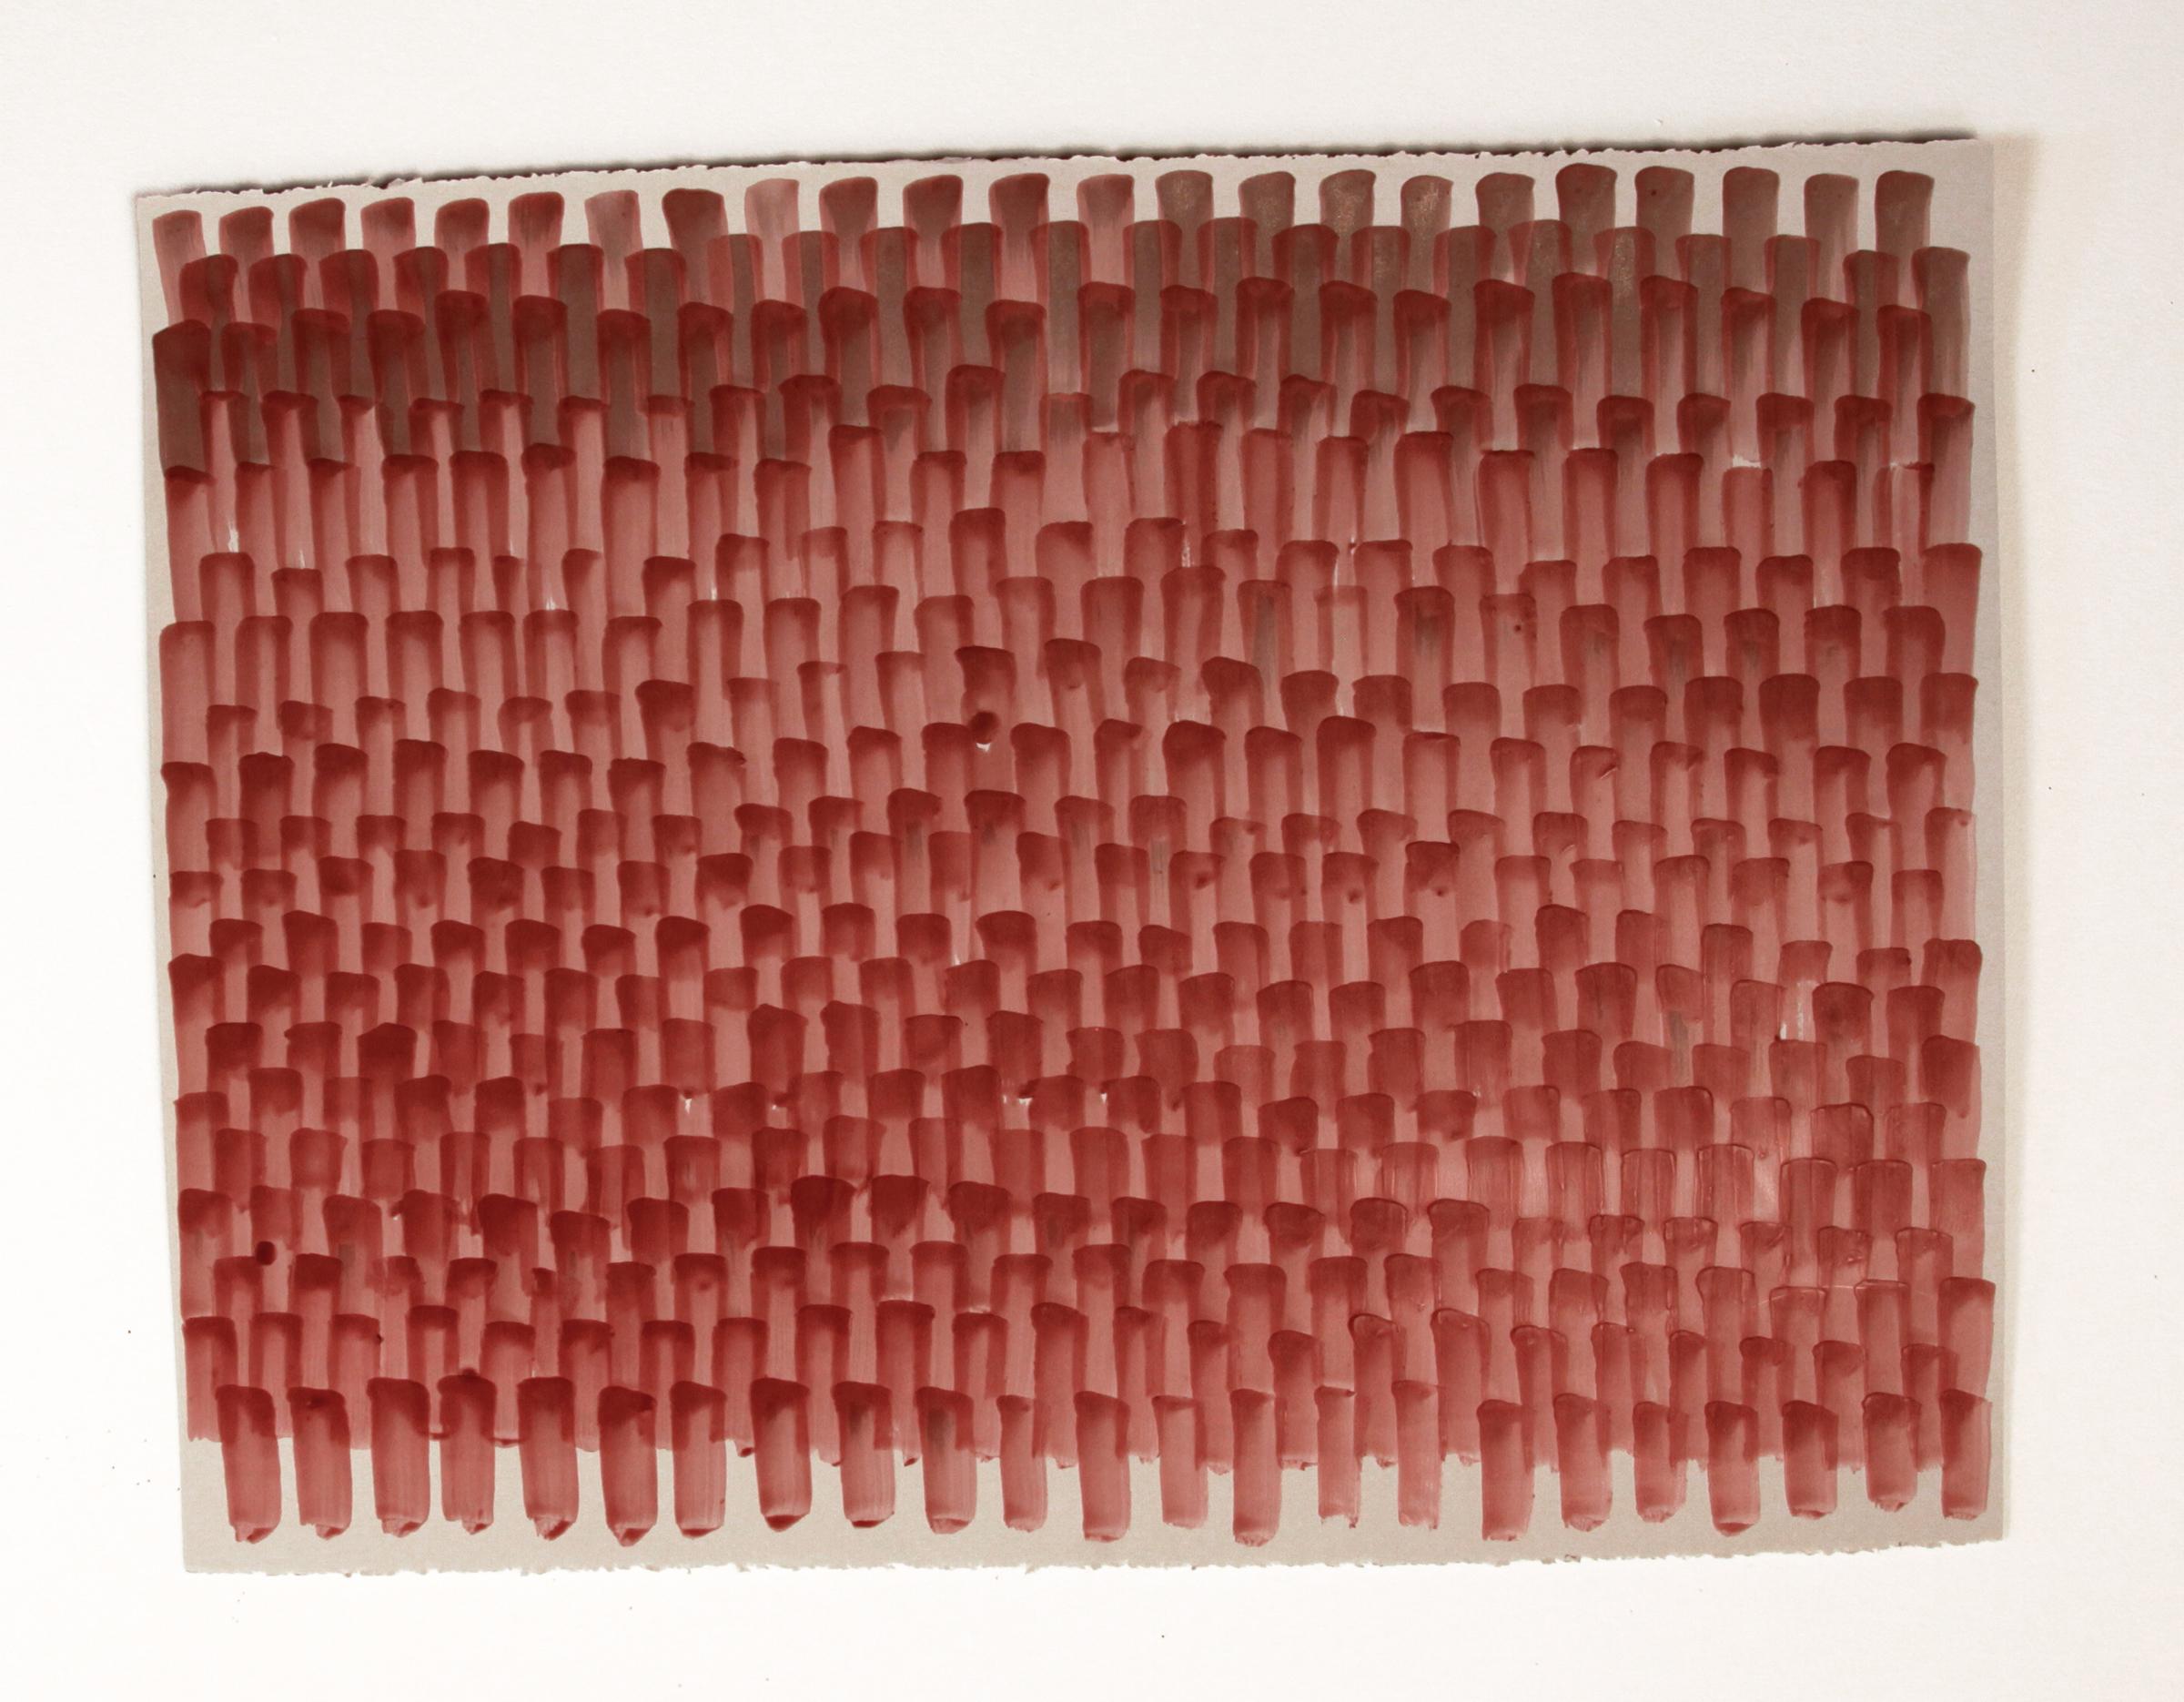 Bricks 2, 2016, Encaustic on acid-free paper, 22-1/2 x 30 inches